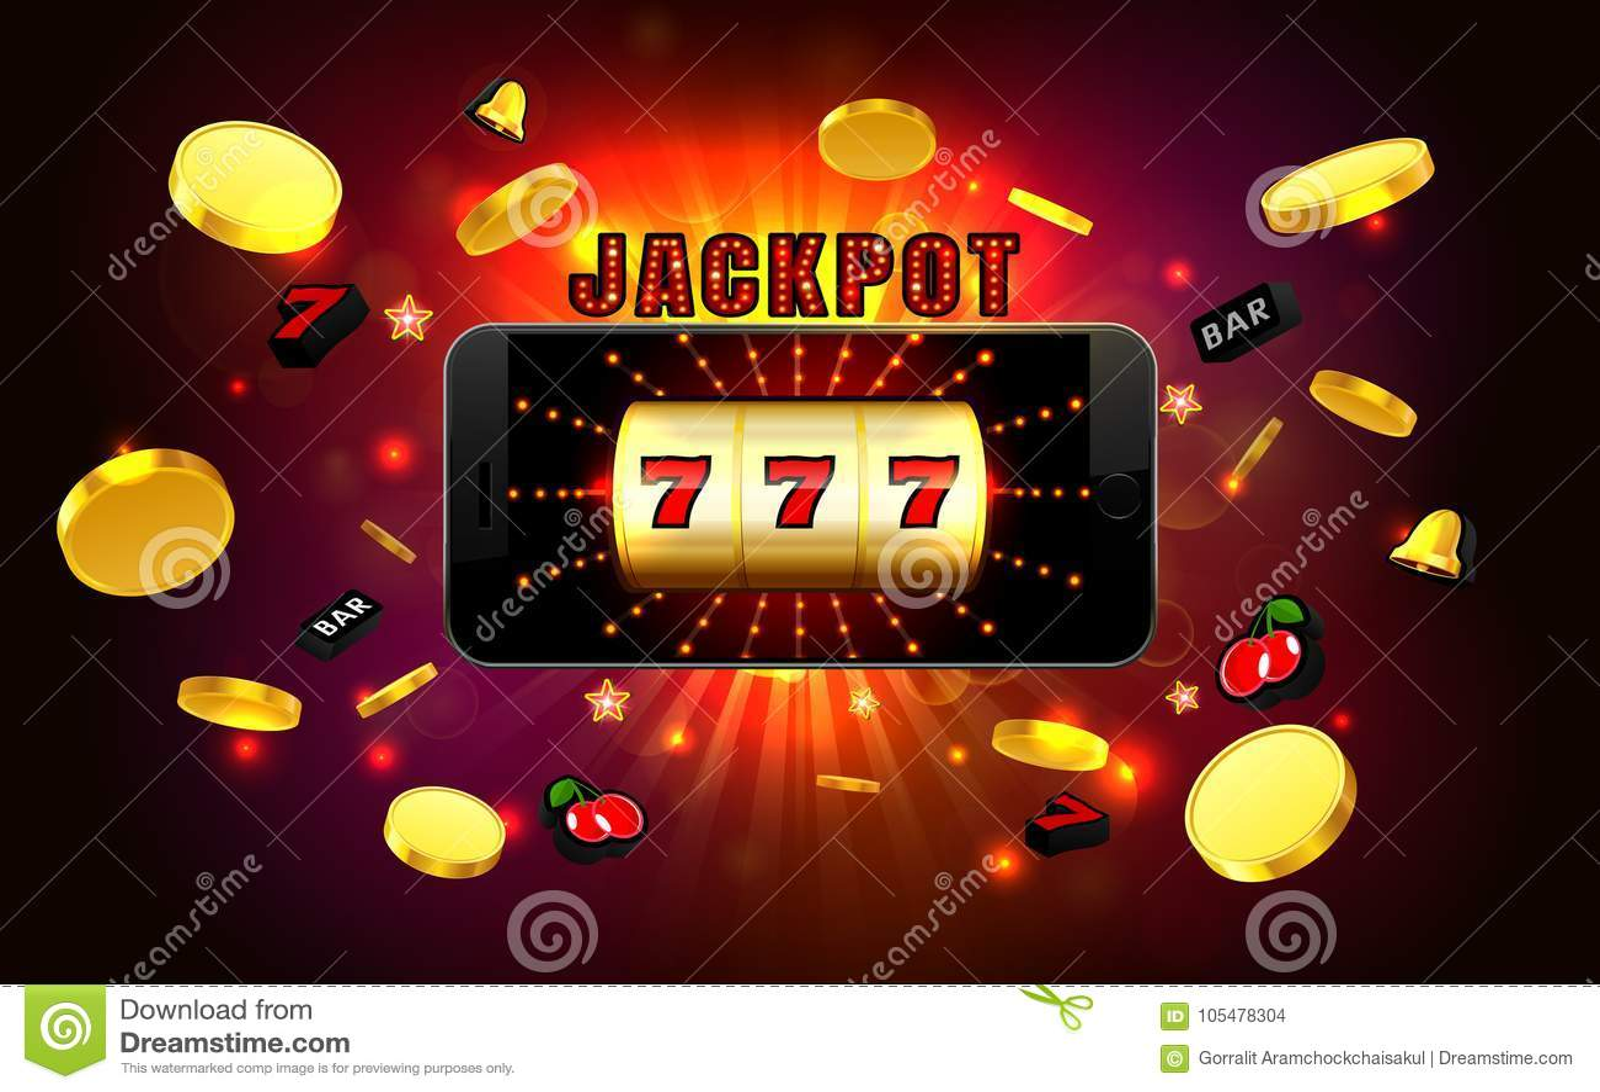 Elite guide online casino